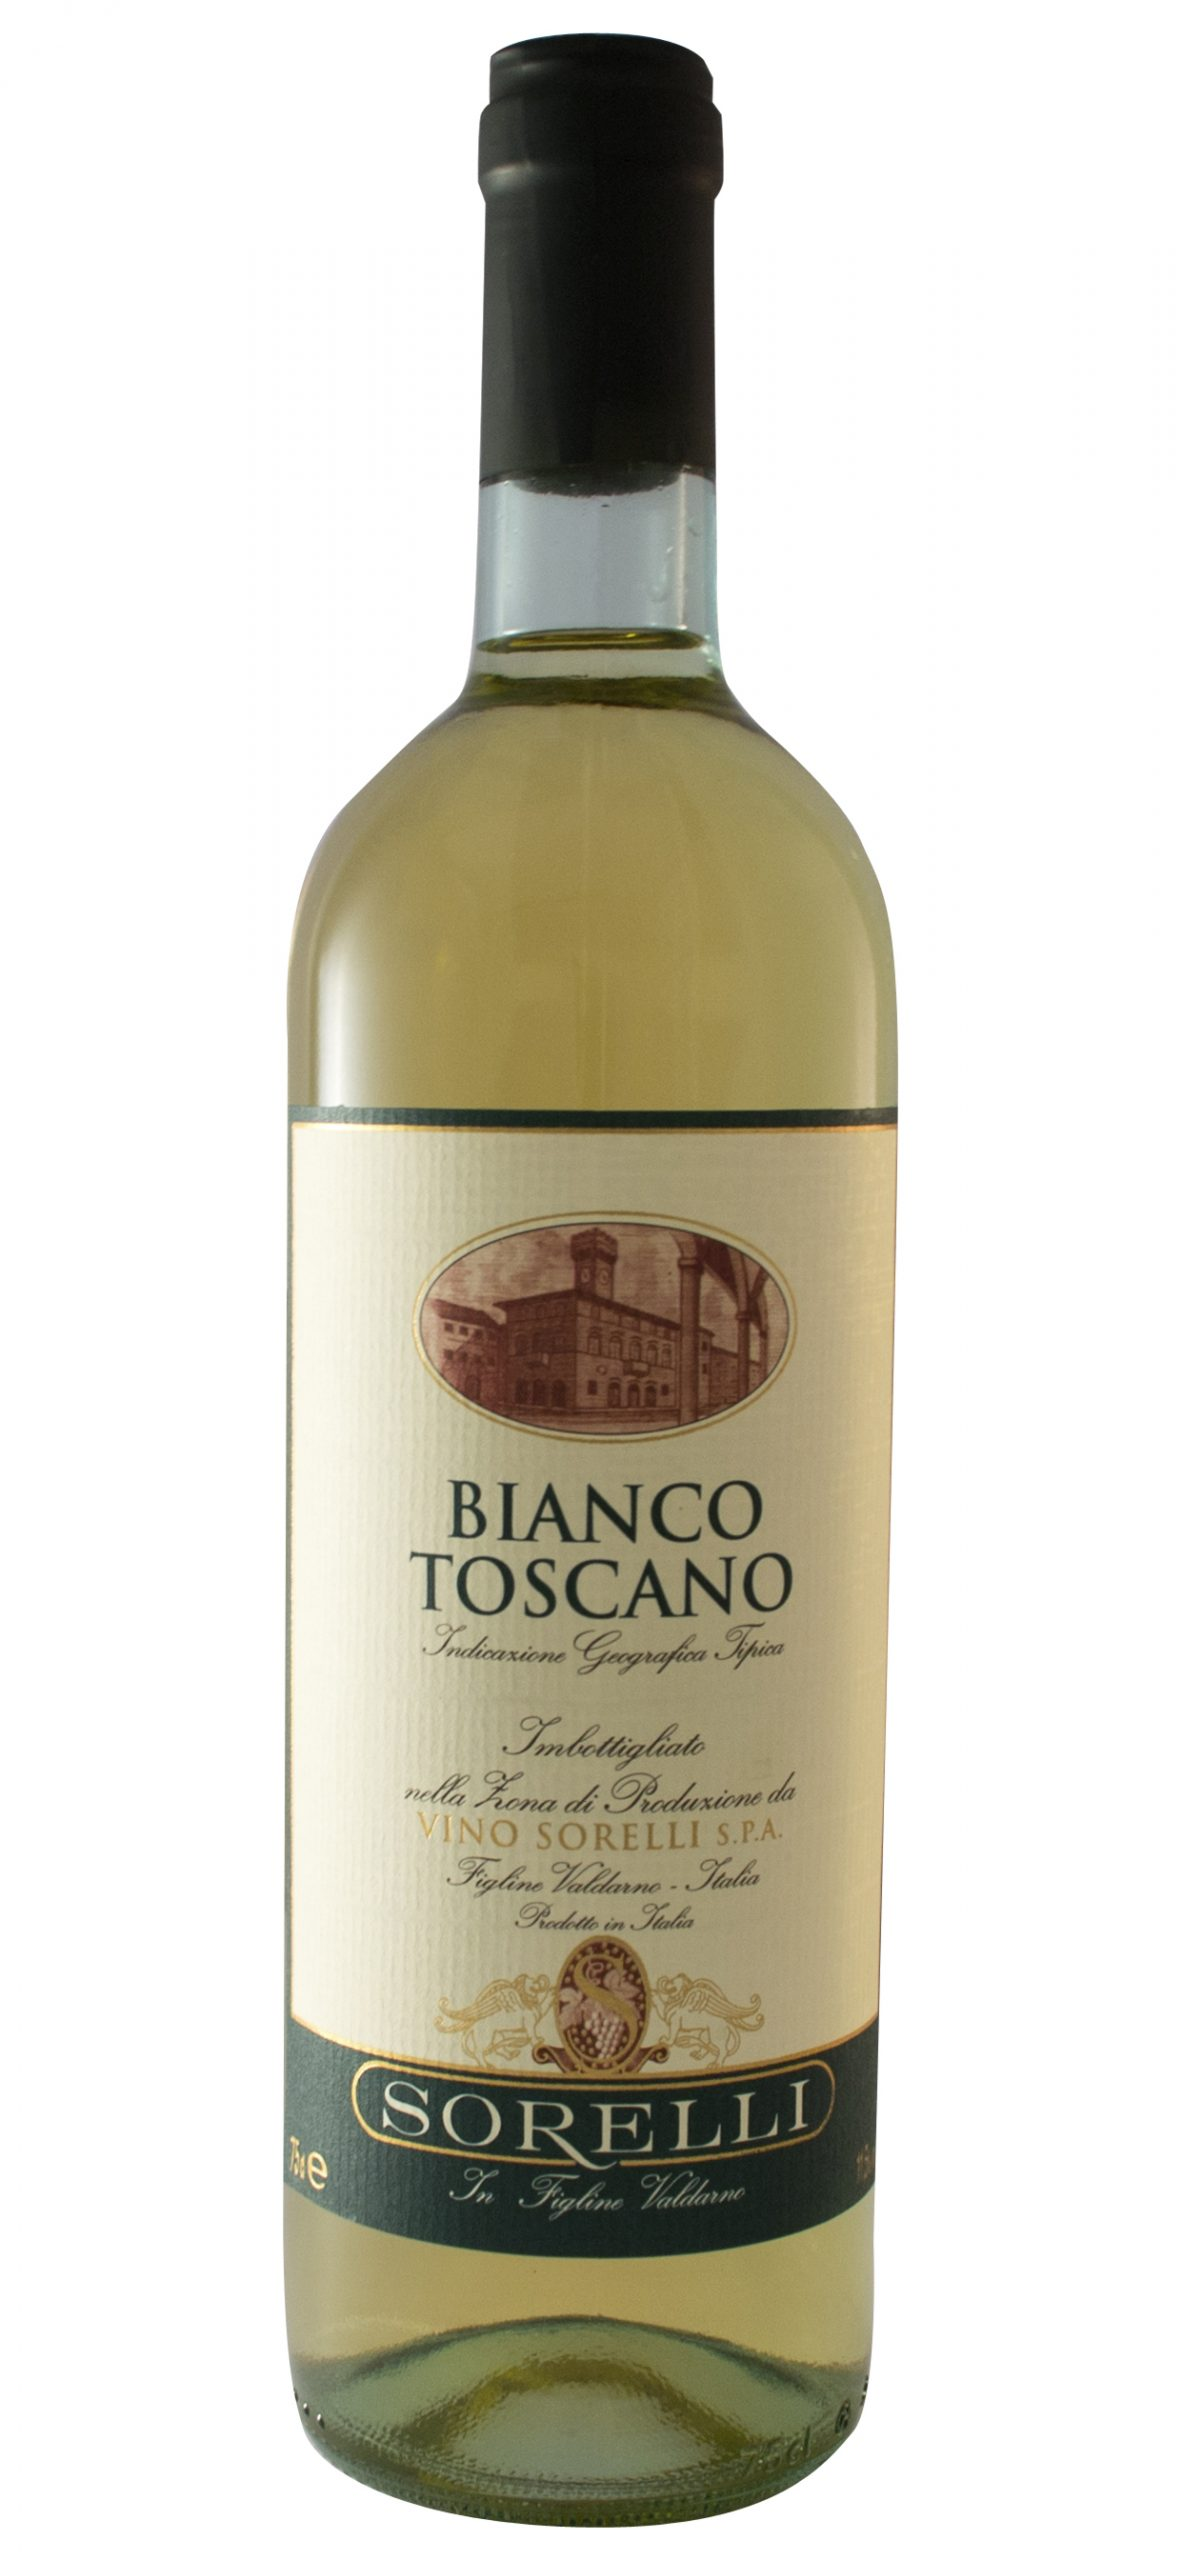 TOSCANO BIANCO IGT